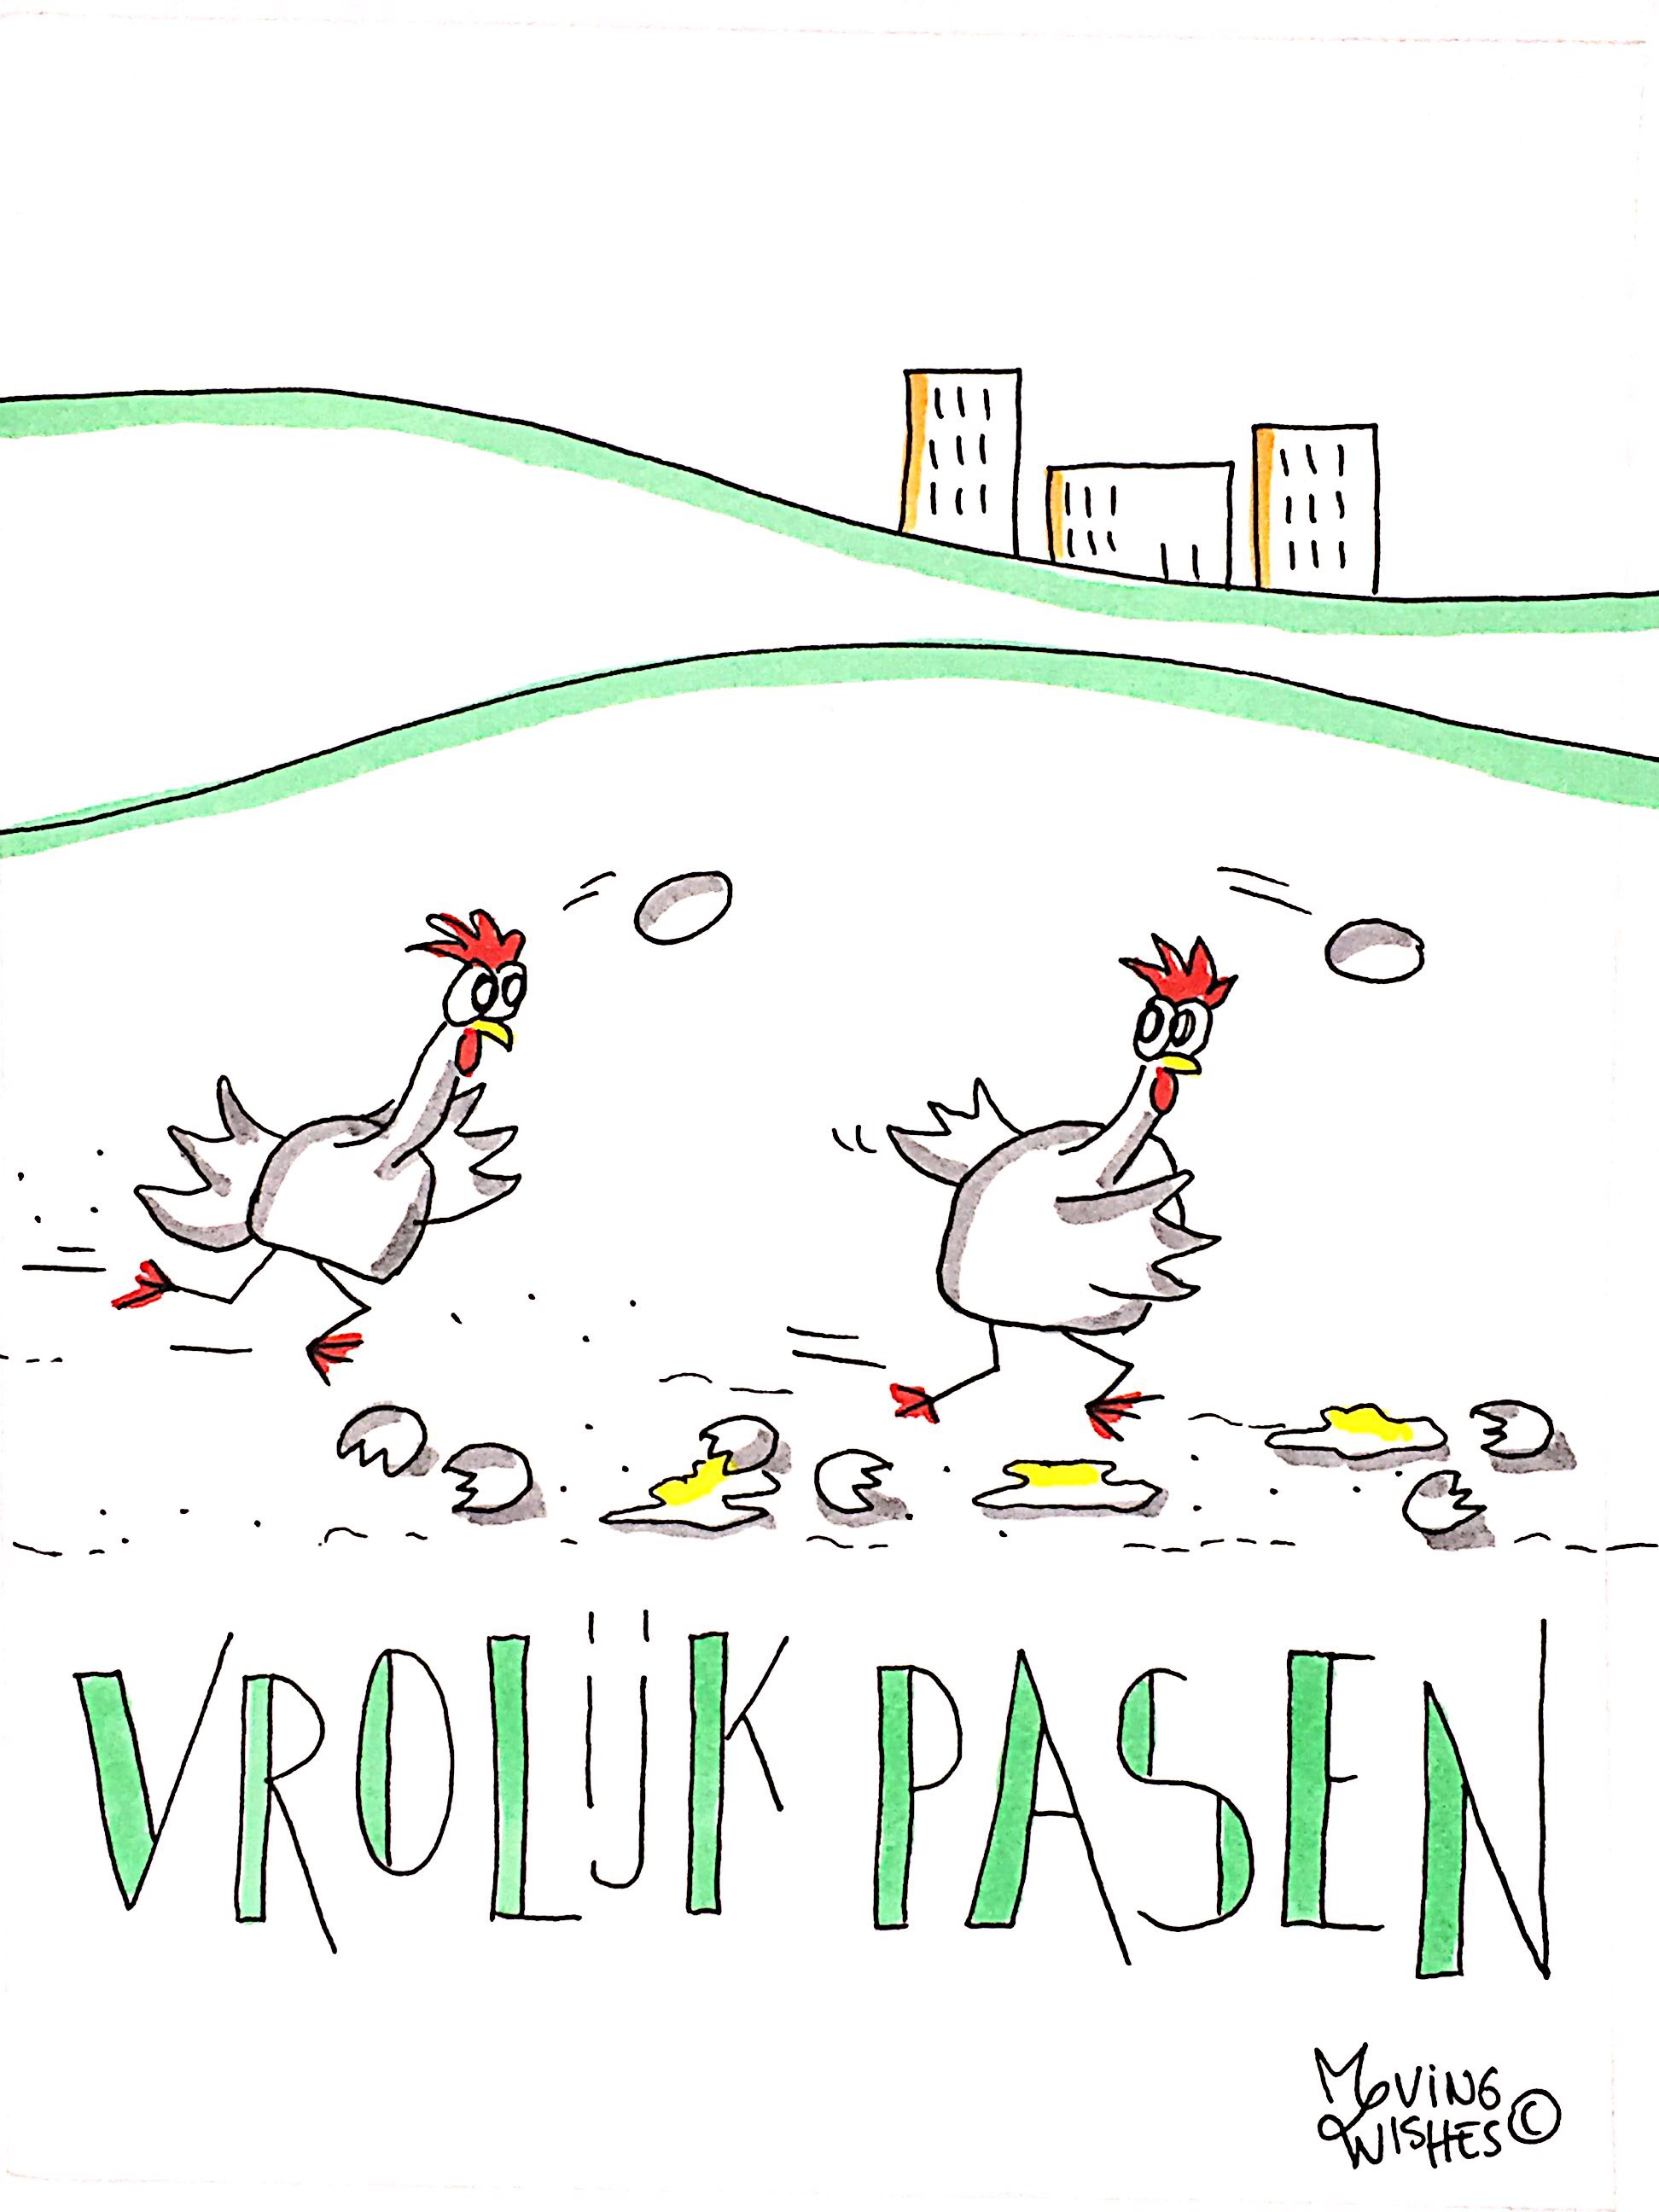 Wenskaart pasen met rennende kippen.